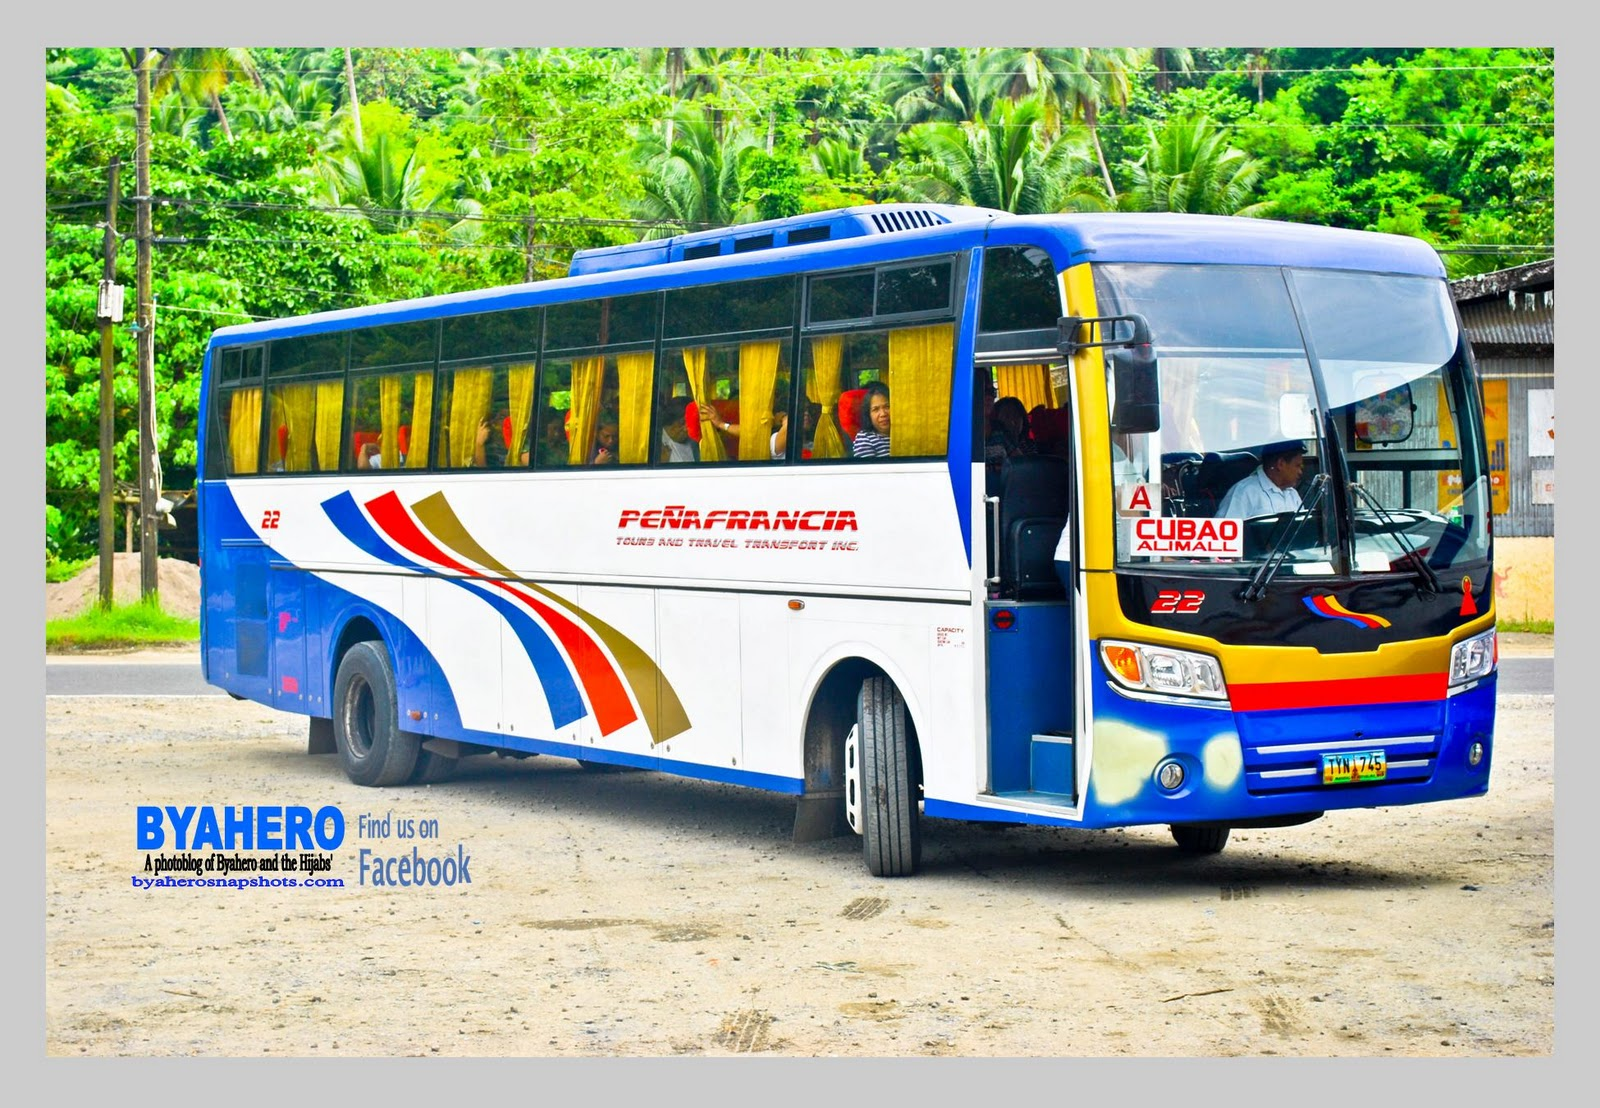 Byahero Penafrancia Tours Amp Travel Transport Inc